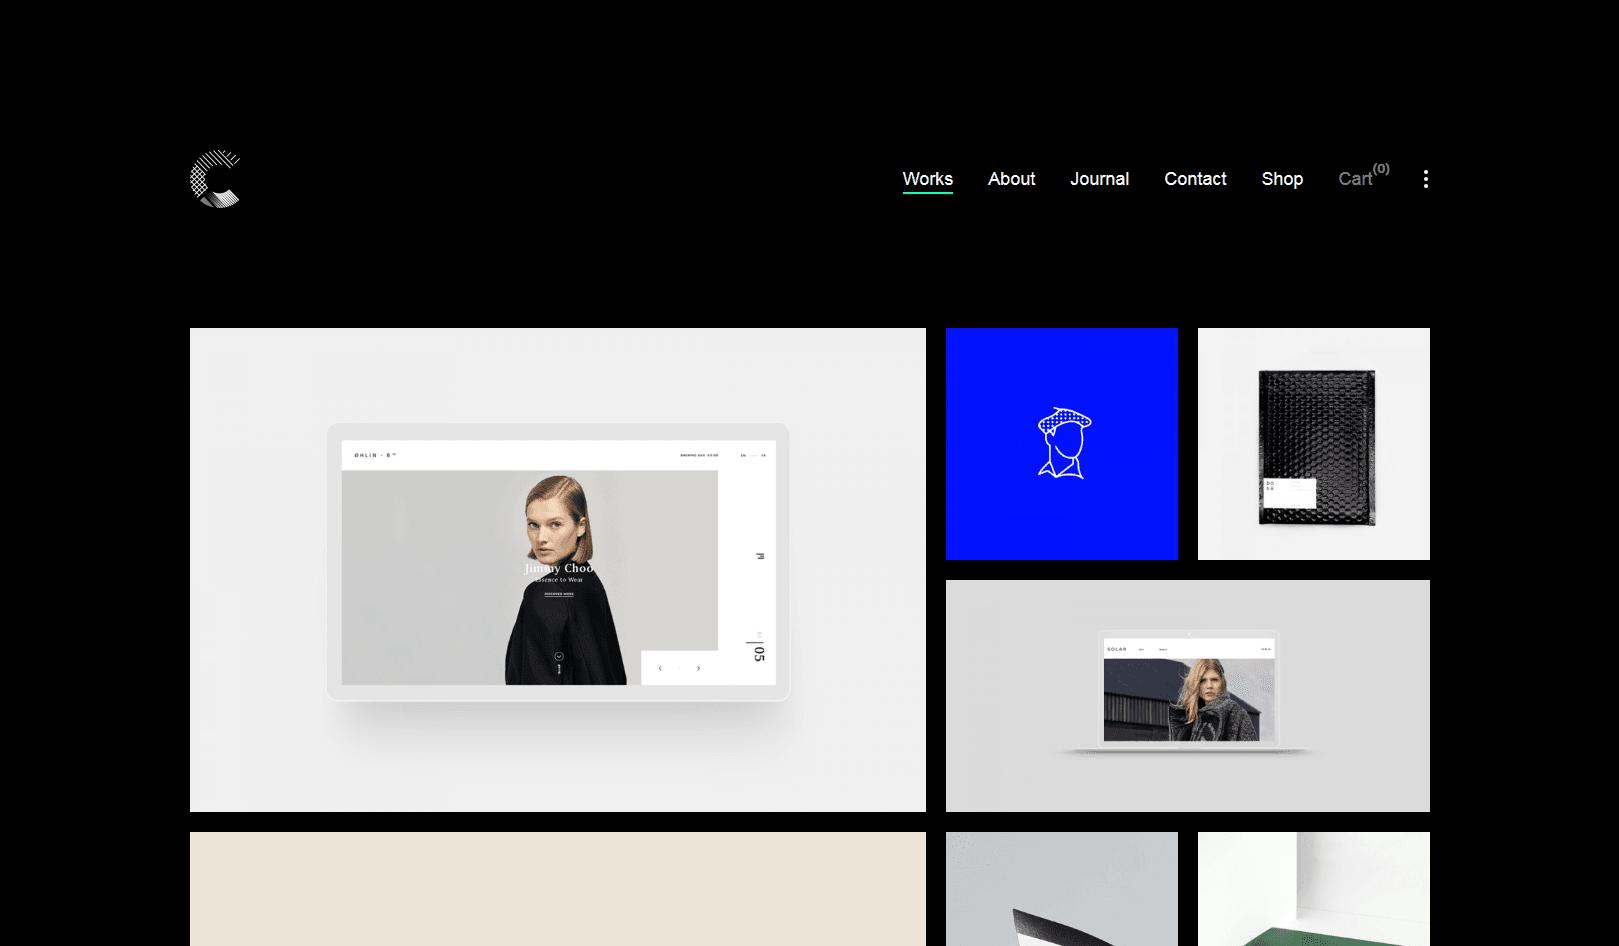 WP-Calafate-minimalist-theme-display-compressor